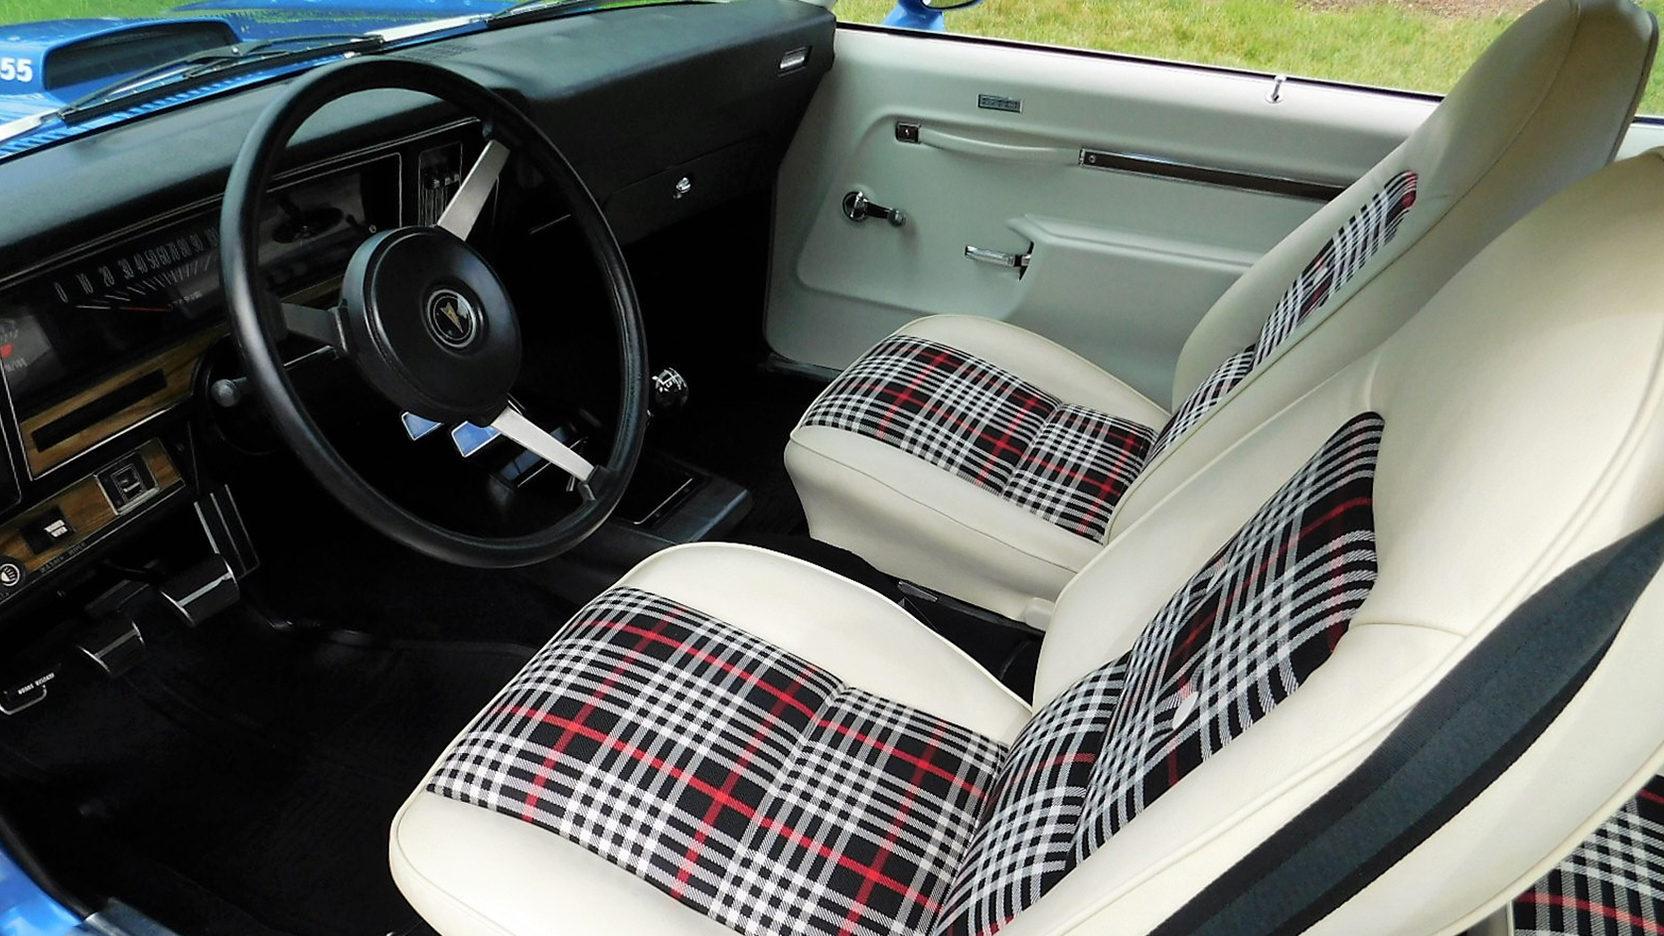 1974 Pontiac GTO two tone interior